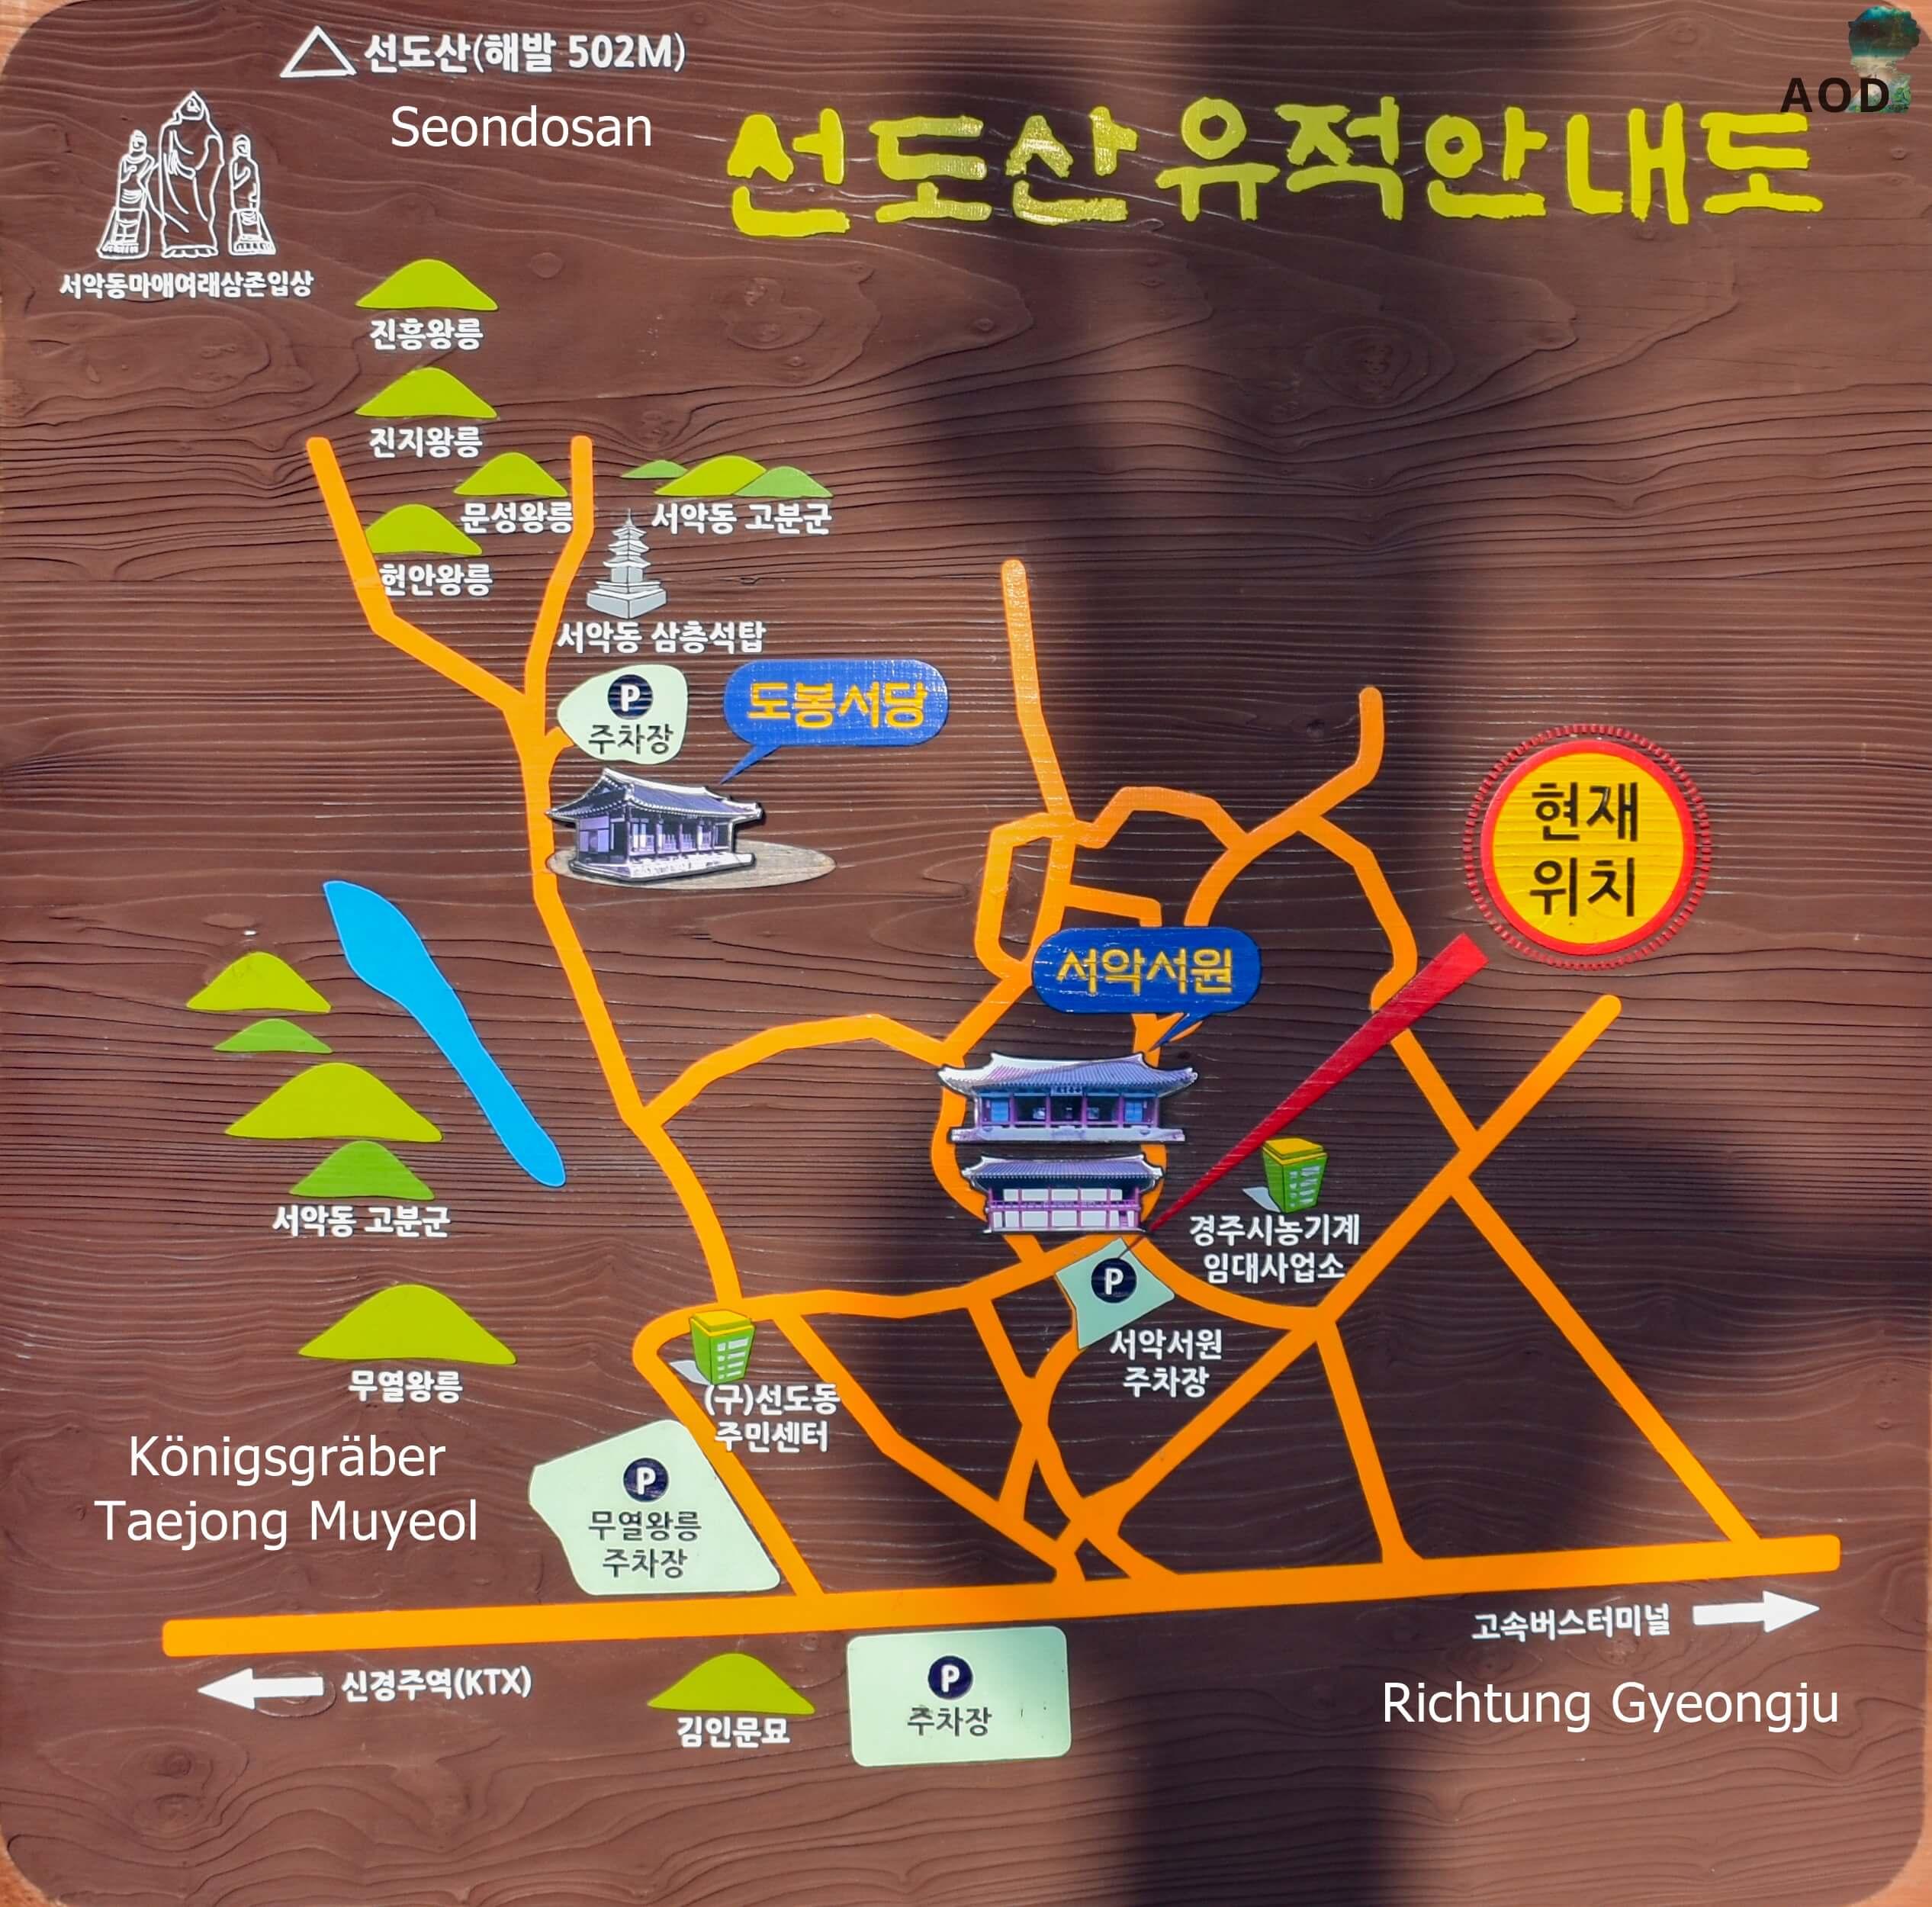 Umgebungskarte vom Seondosan